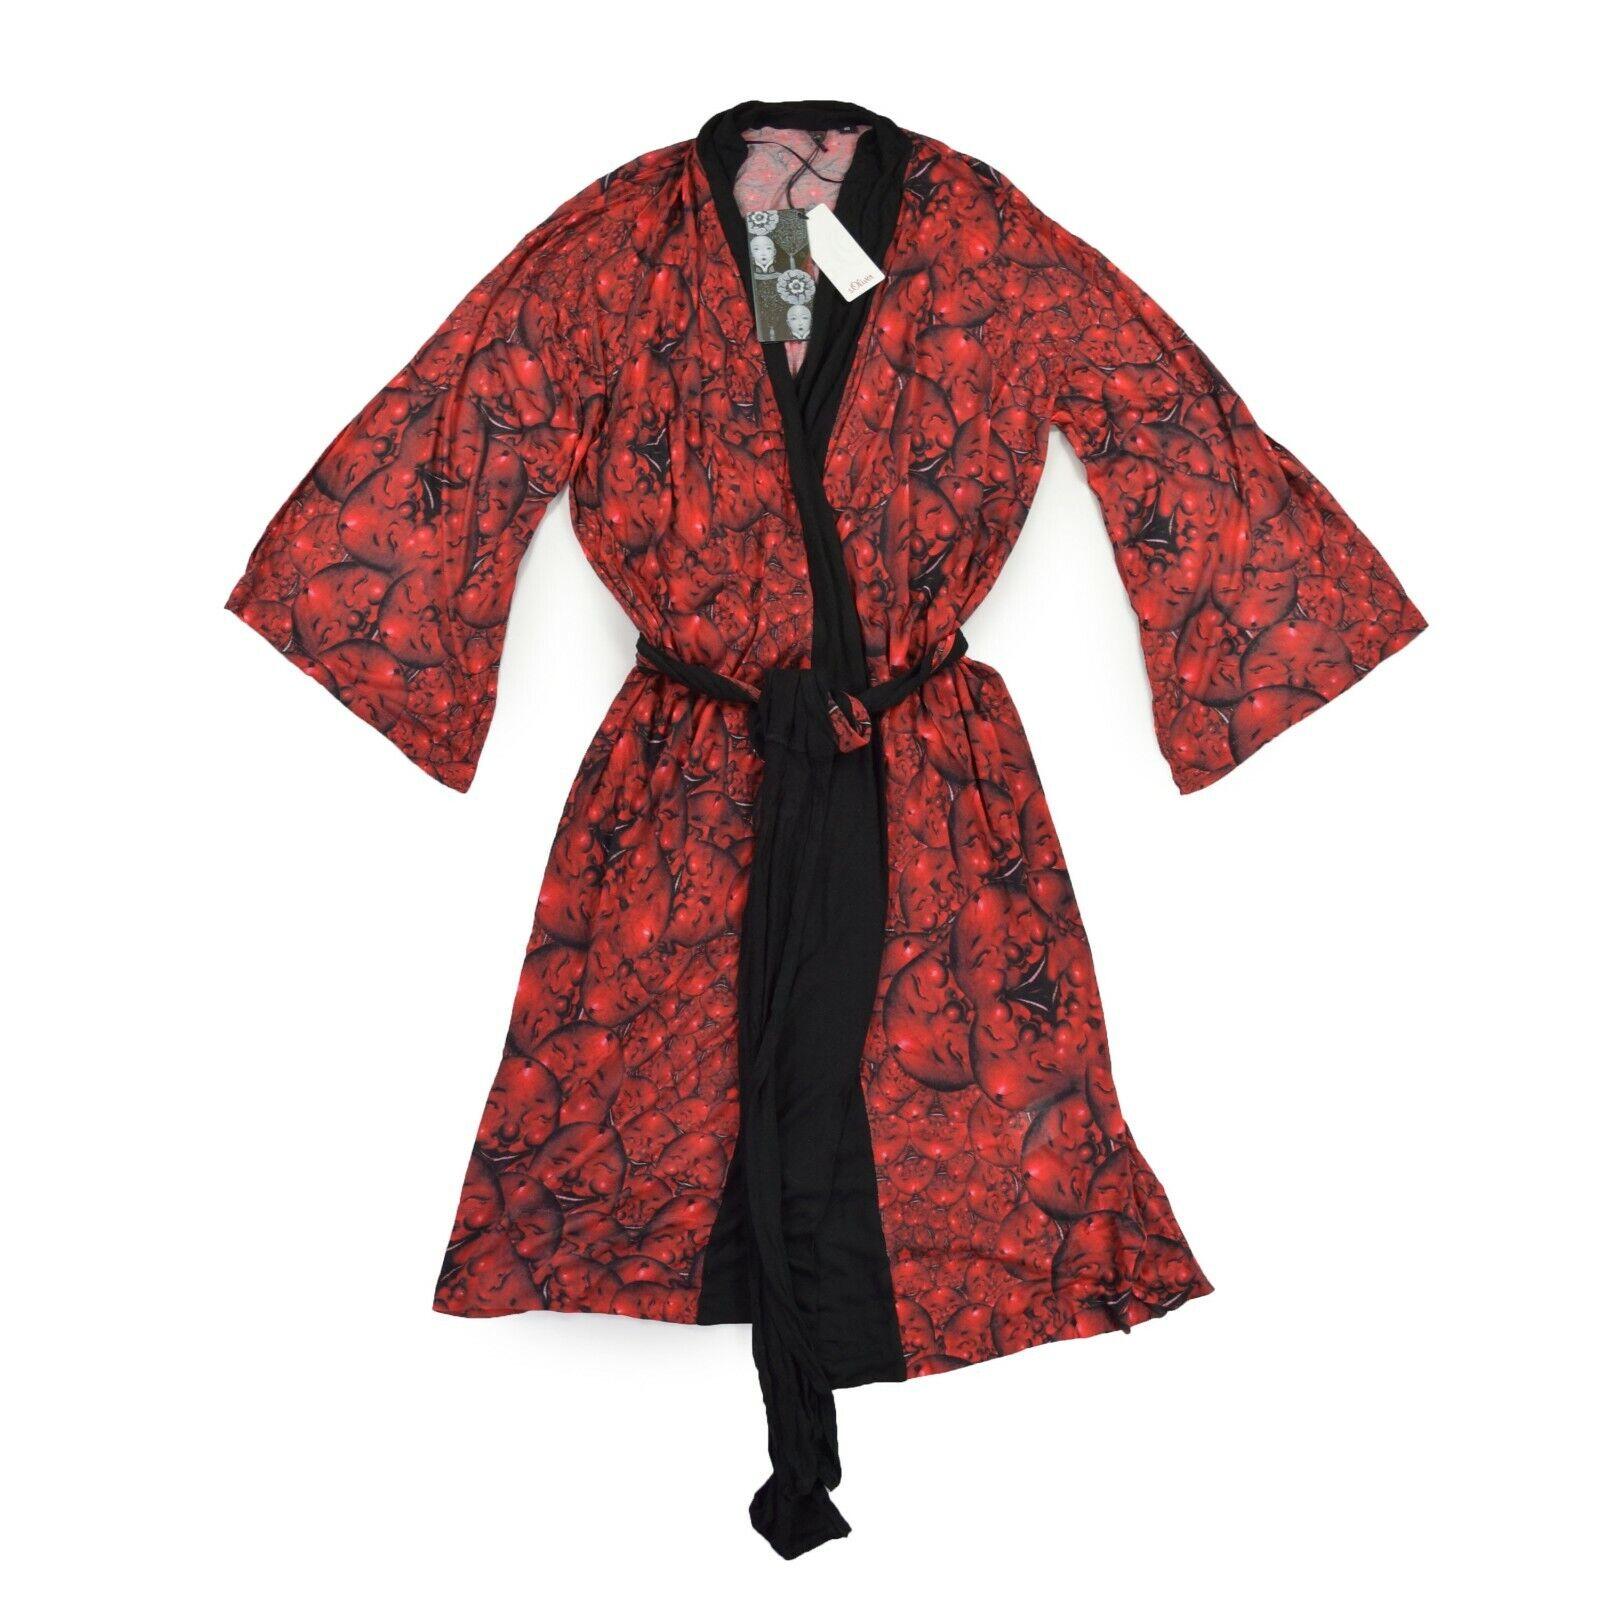 S.  Oliver Art Collection qiu shengxian señora kimono l 40 100% viscosa ropa de noche  nuevo listado